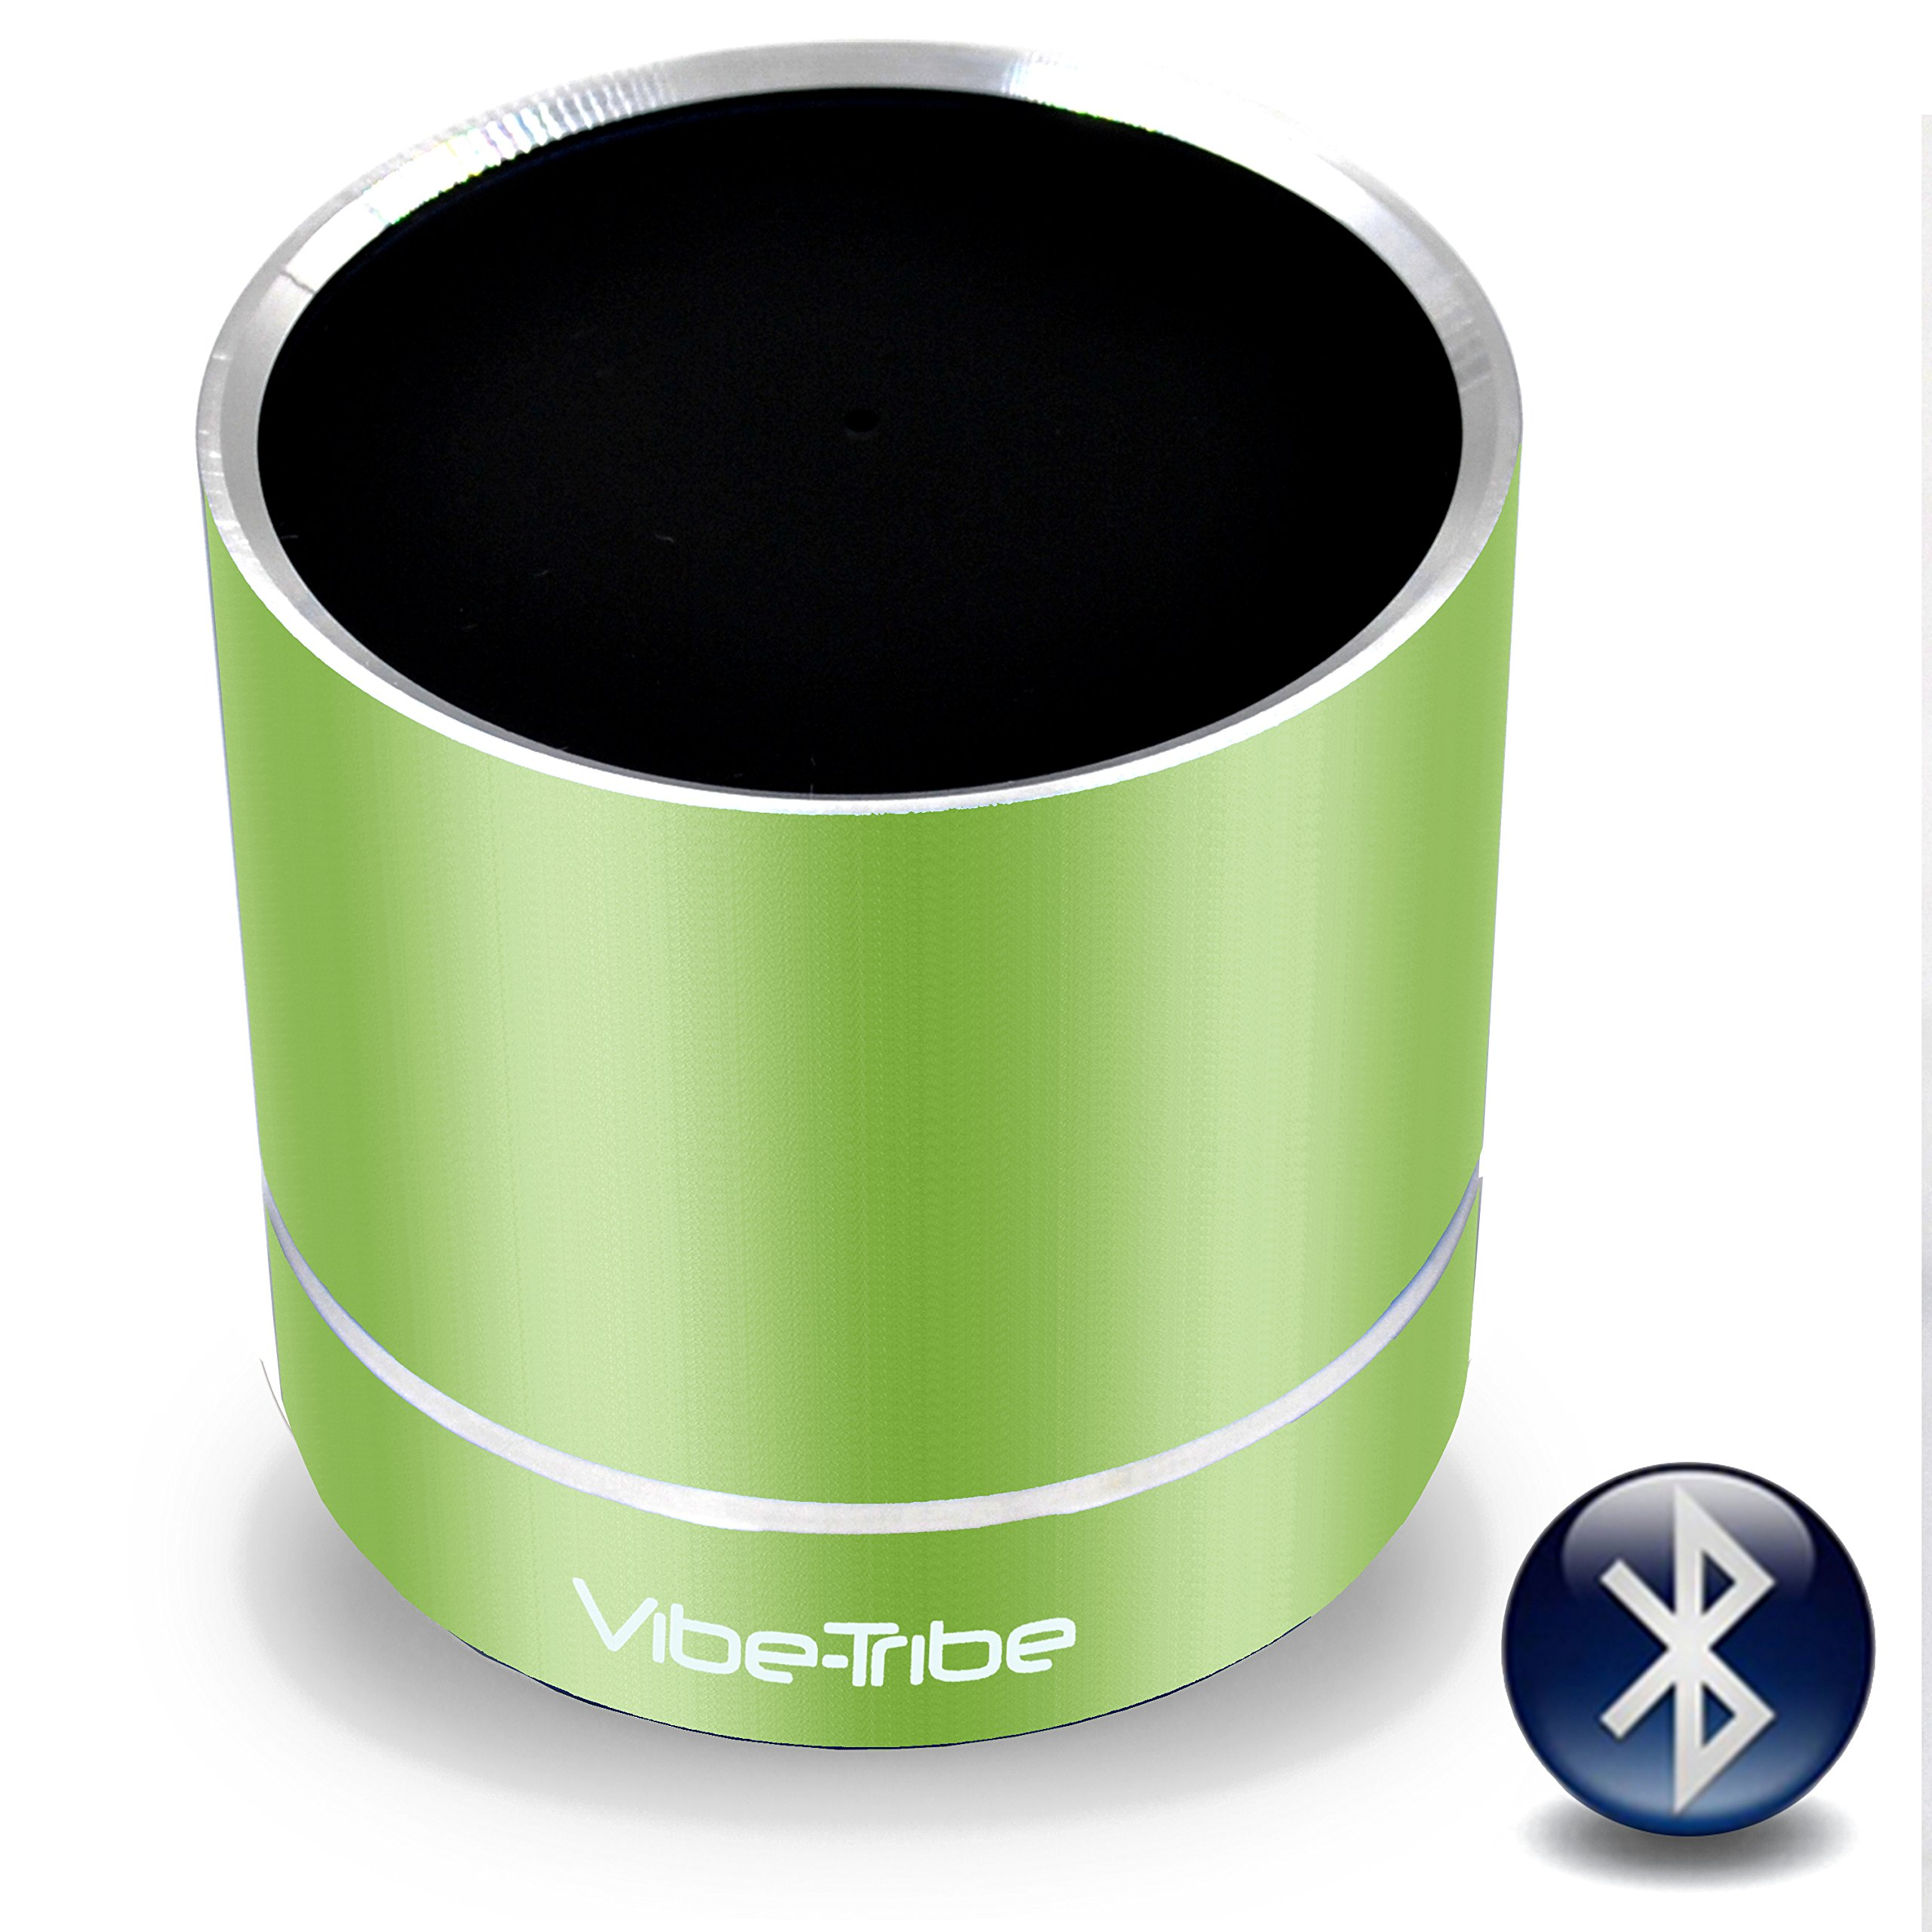 Vibe-Tribe Troll Plus Lime Green: 12 Watt Bluetooth Vibration Speaker with Hands Free